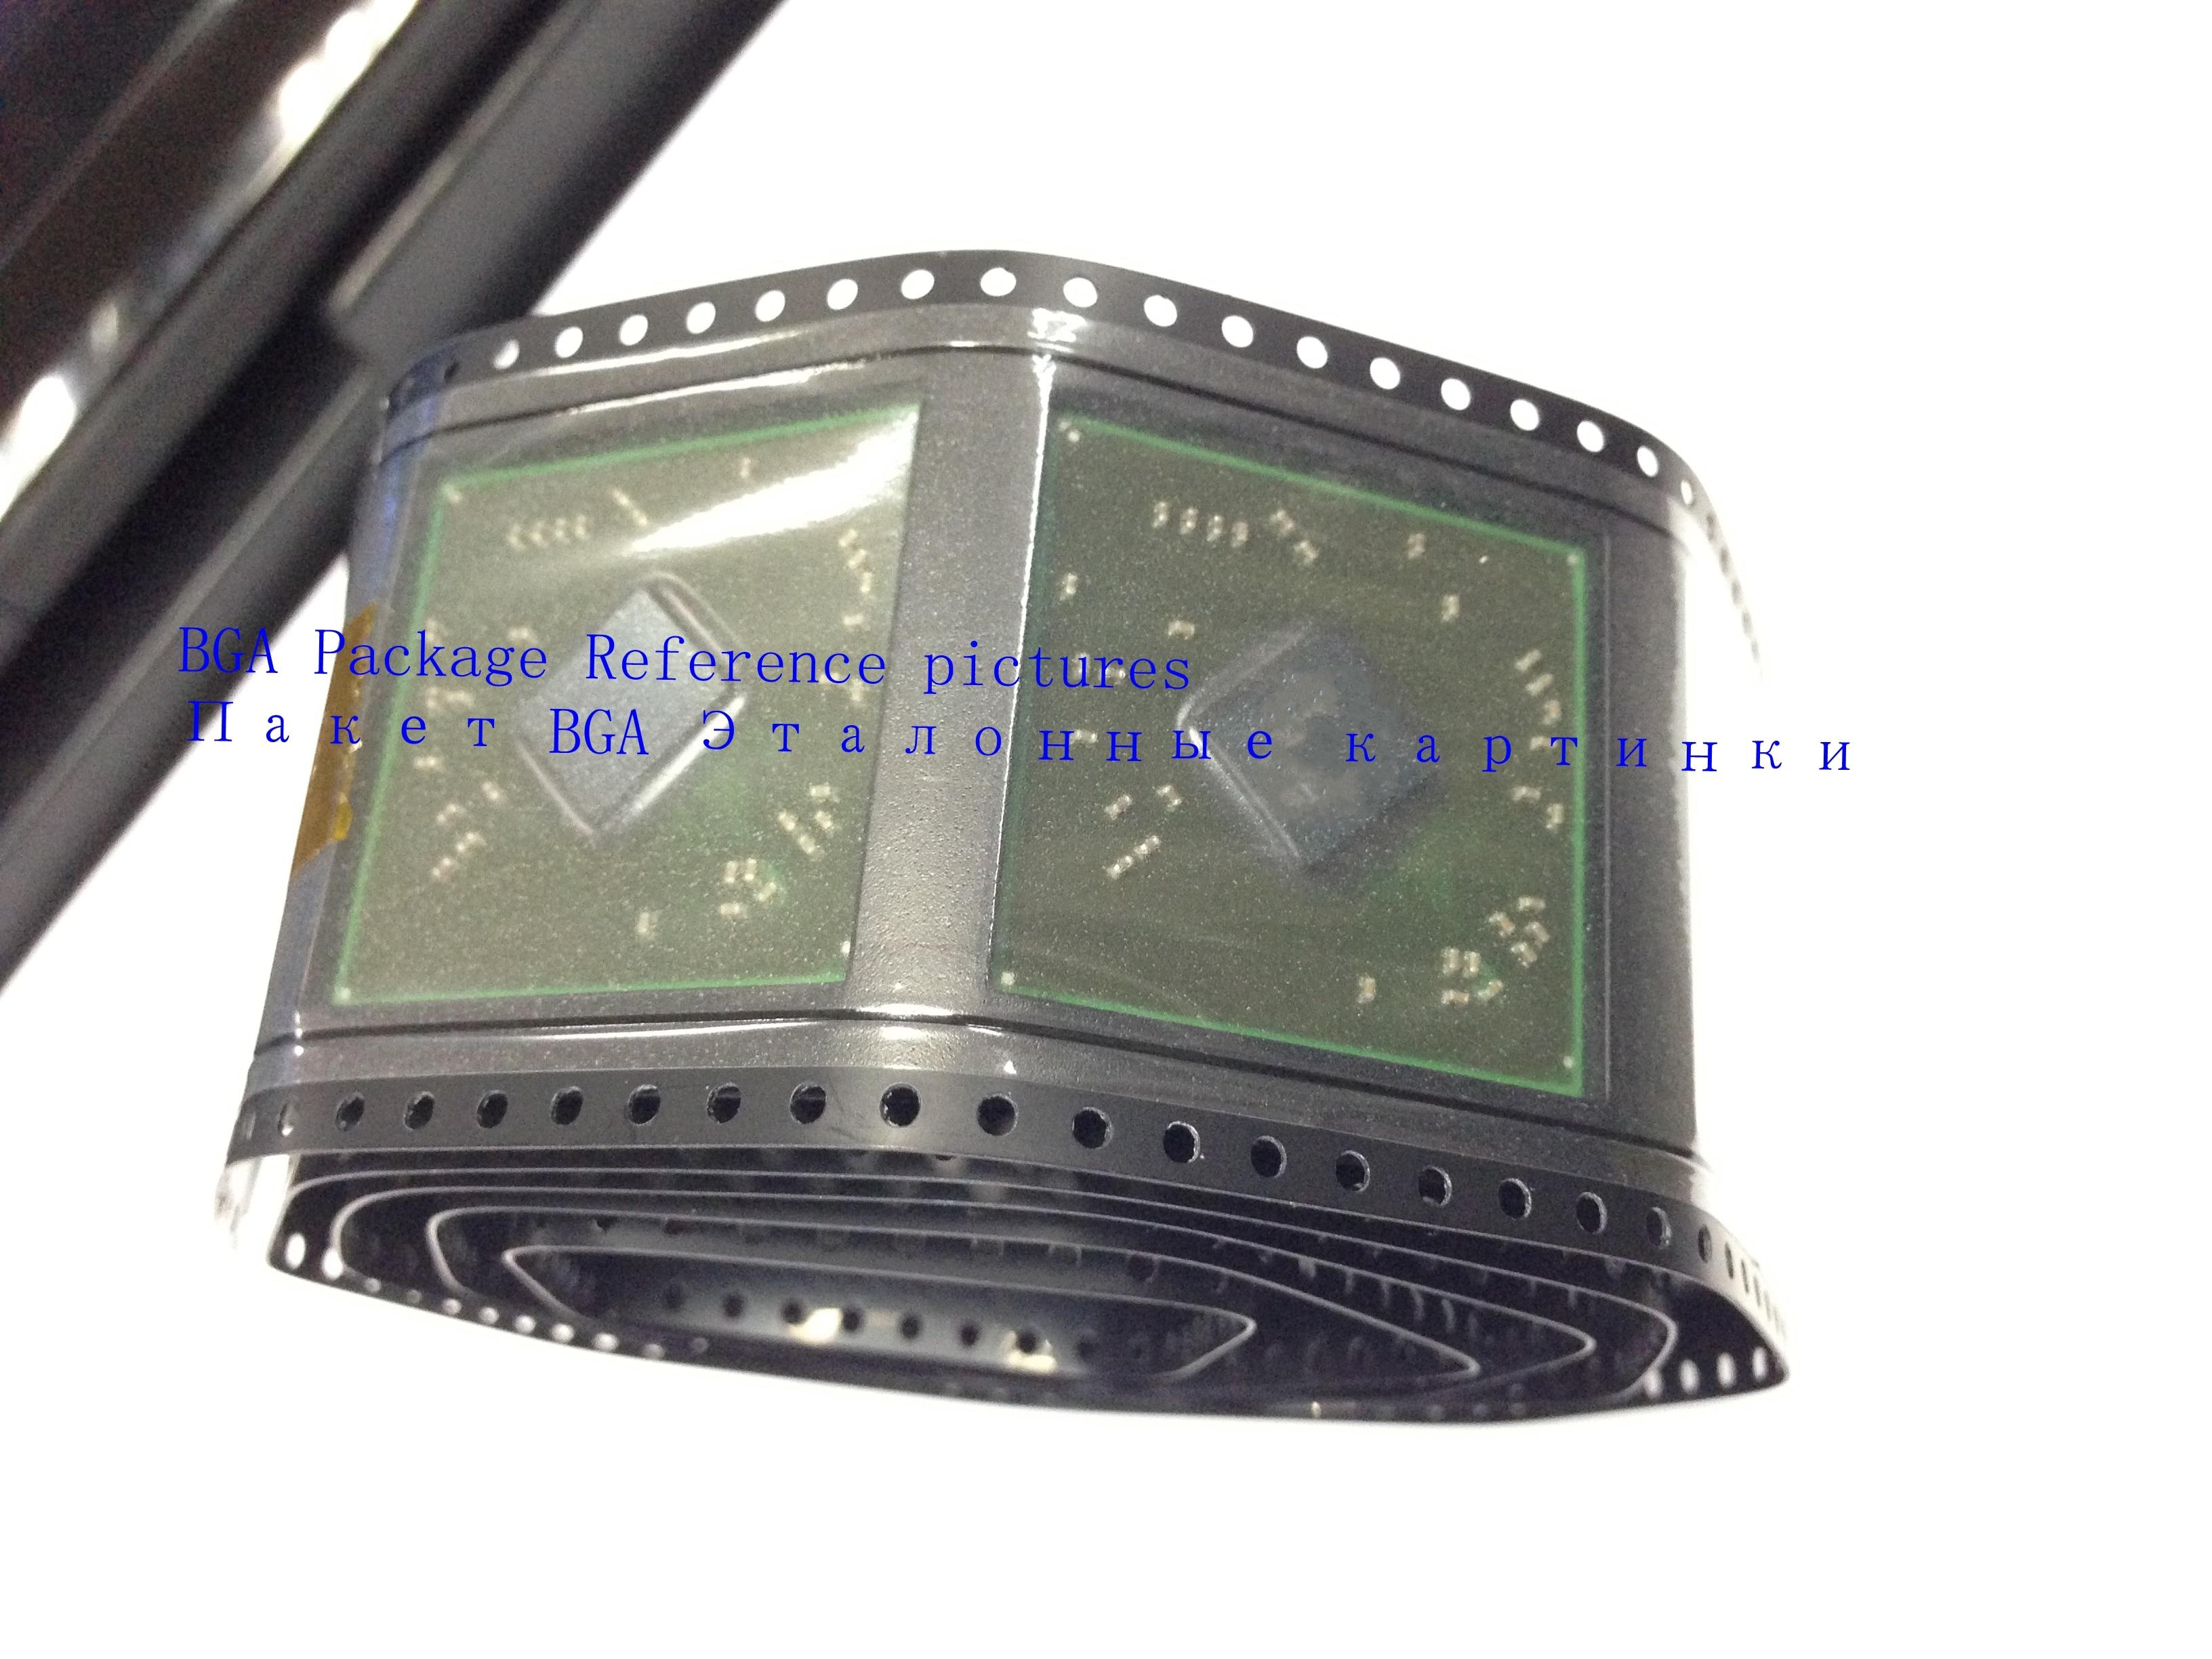 1pcs/lot 100% New N14M-GE-B-A2 N14M GE B A2 BGA Chipset1pcs/lot 100% New N14M-GE-B-A2 N14M GE B A2 BGA Chipset